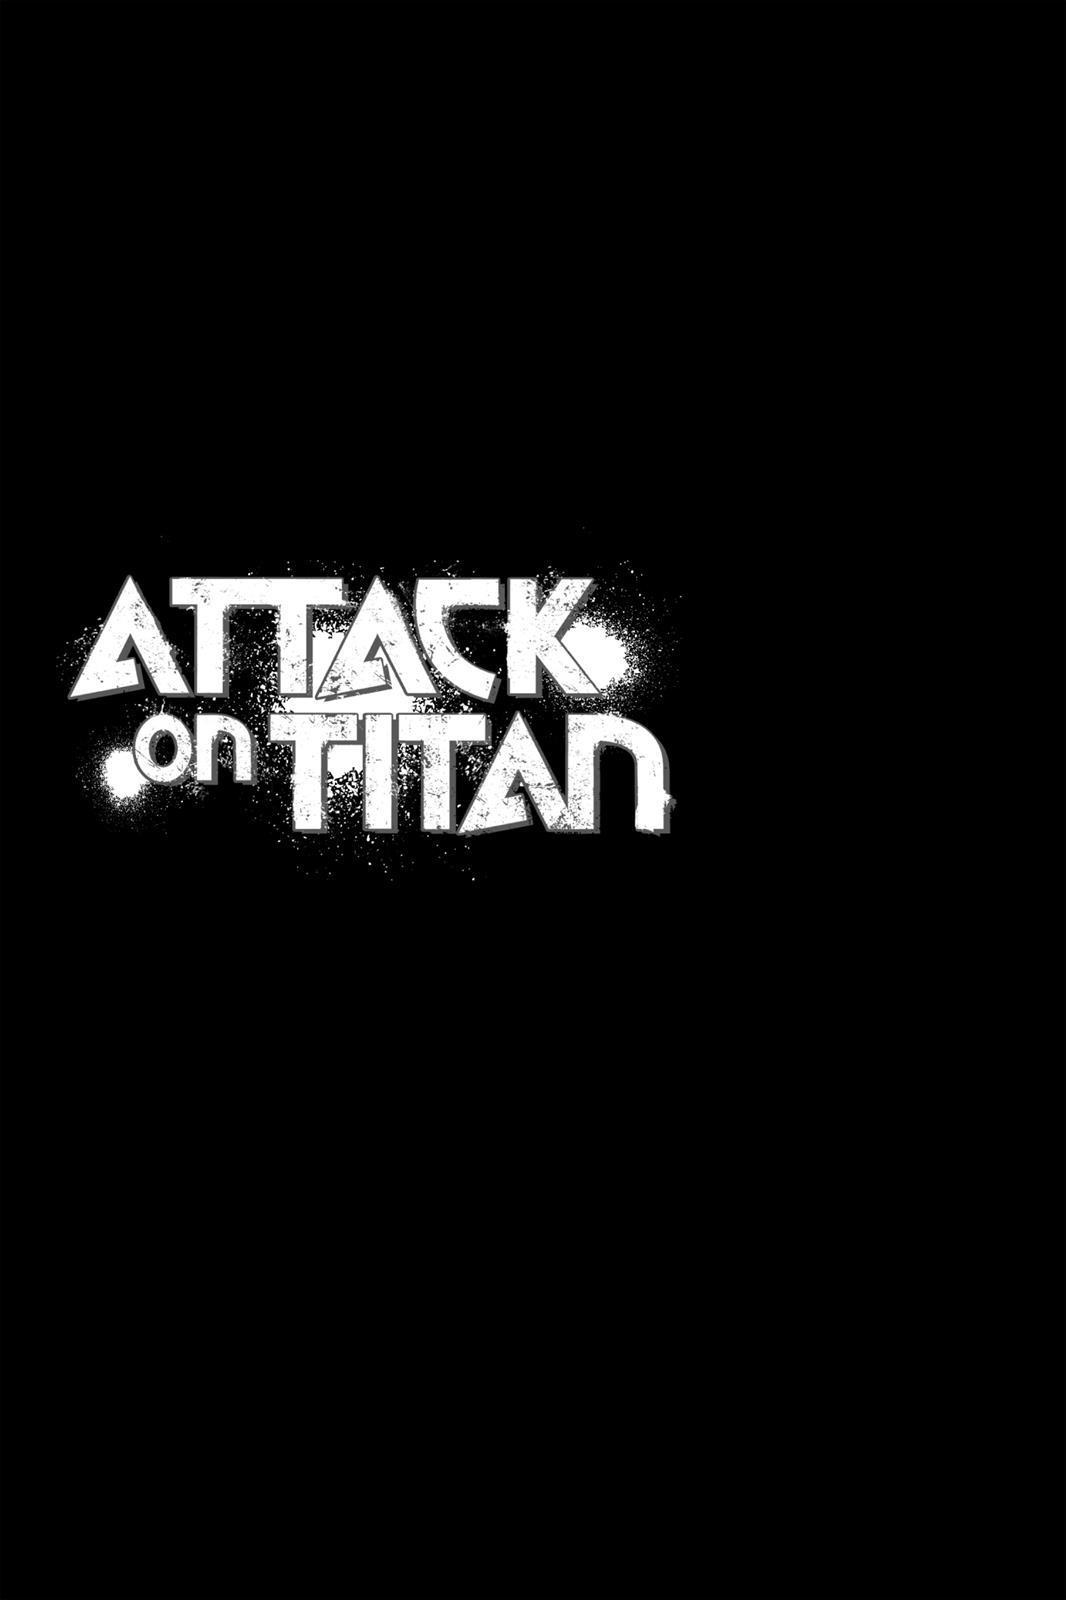 Attack On Titan, Episode 59 image 051